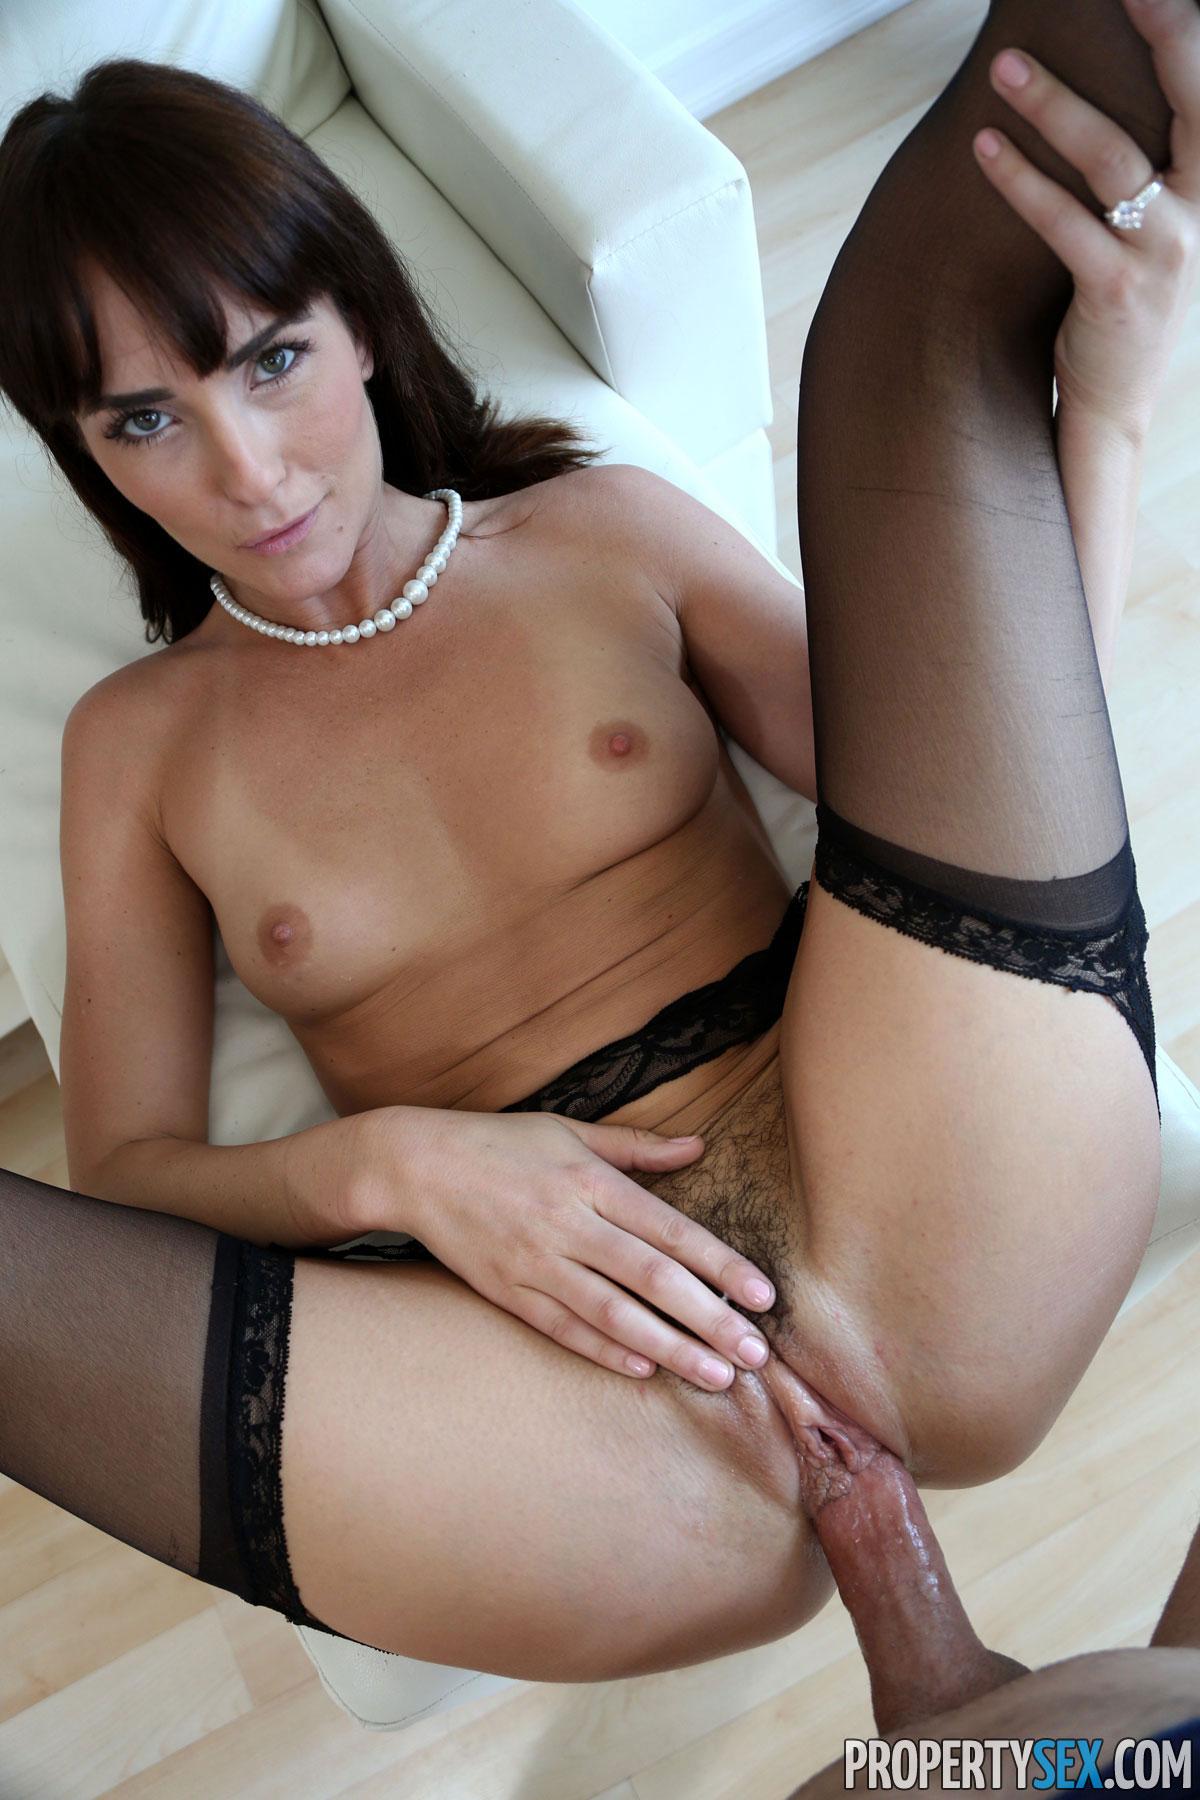 Property Sex Bianca Breeze - Nude Babes First-8833